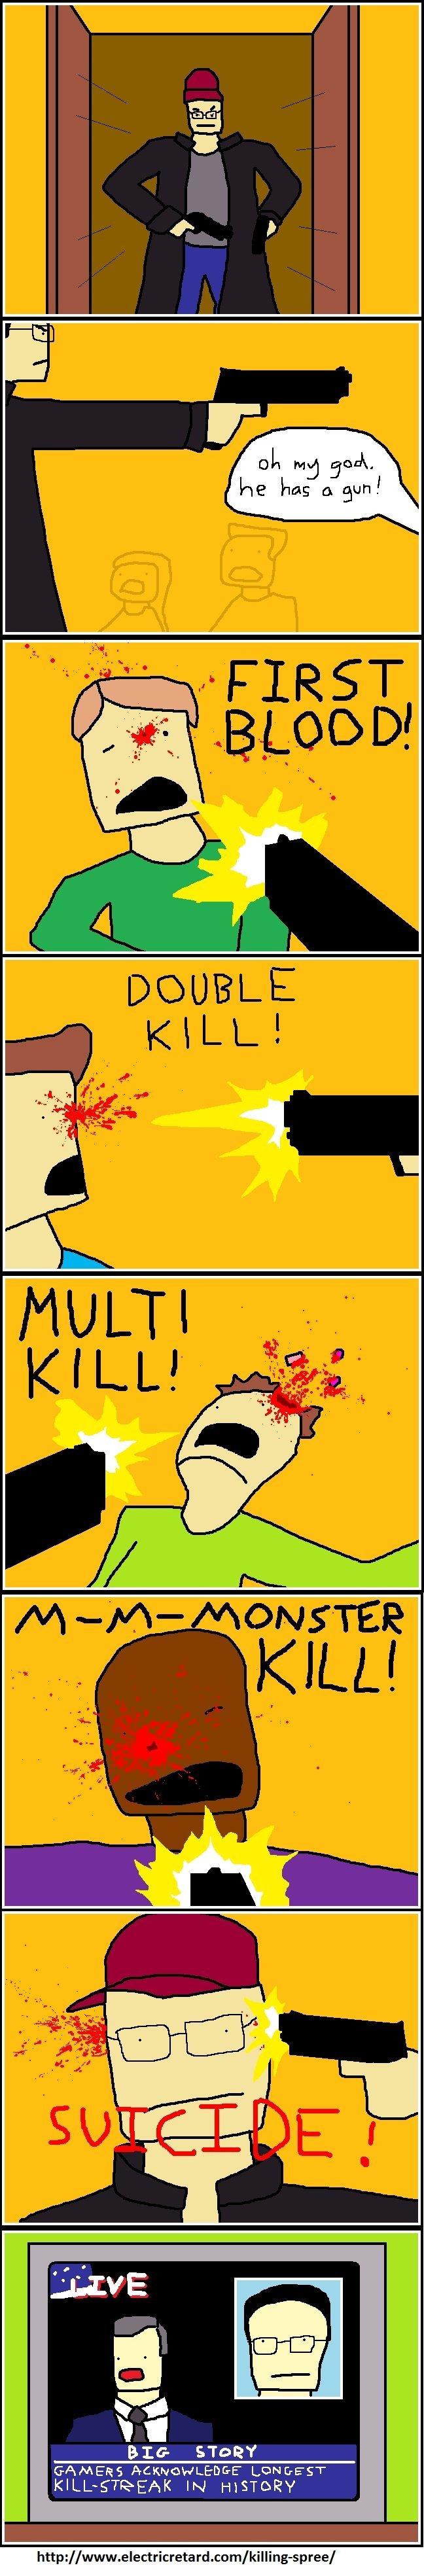 Killing spree. . BIG NEUEN GAMERS A electricretard xom/ /